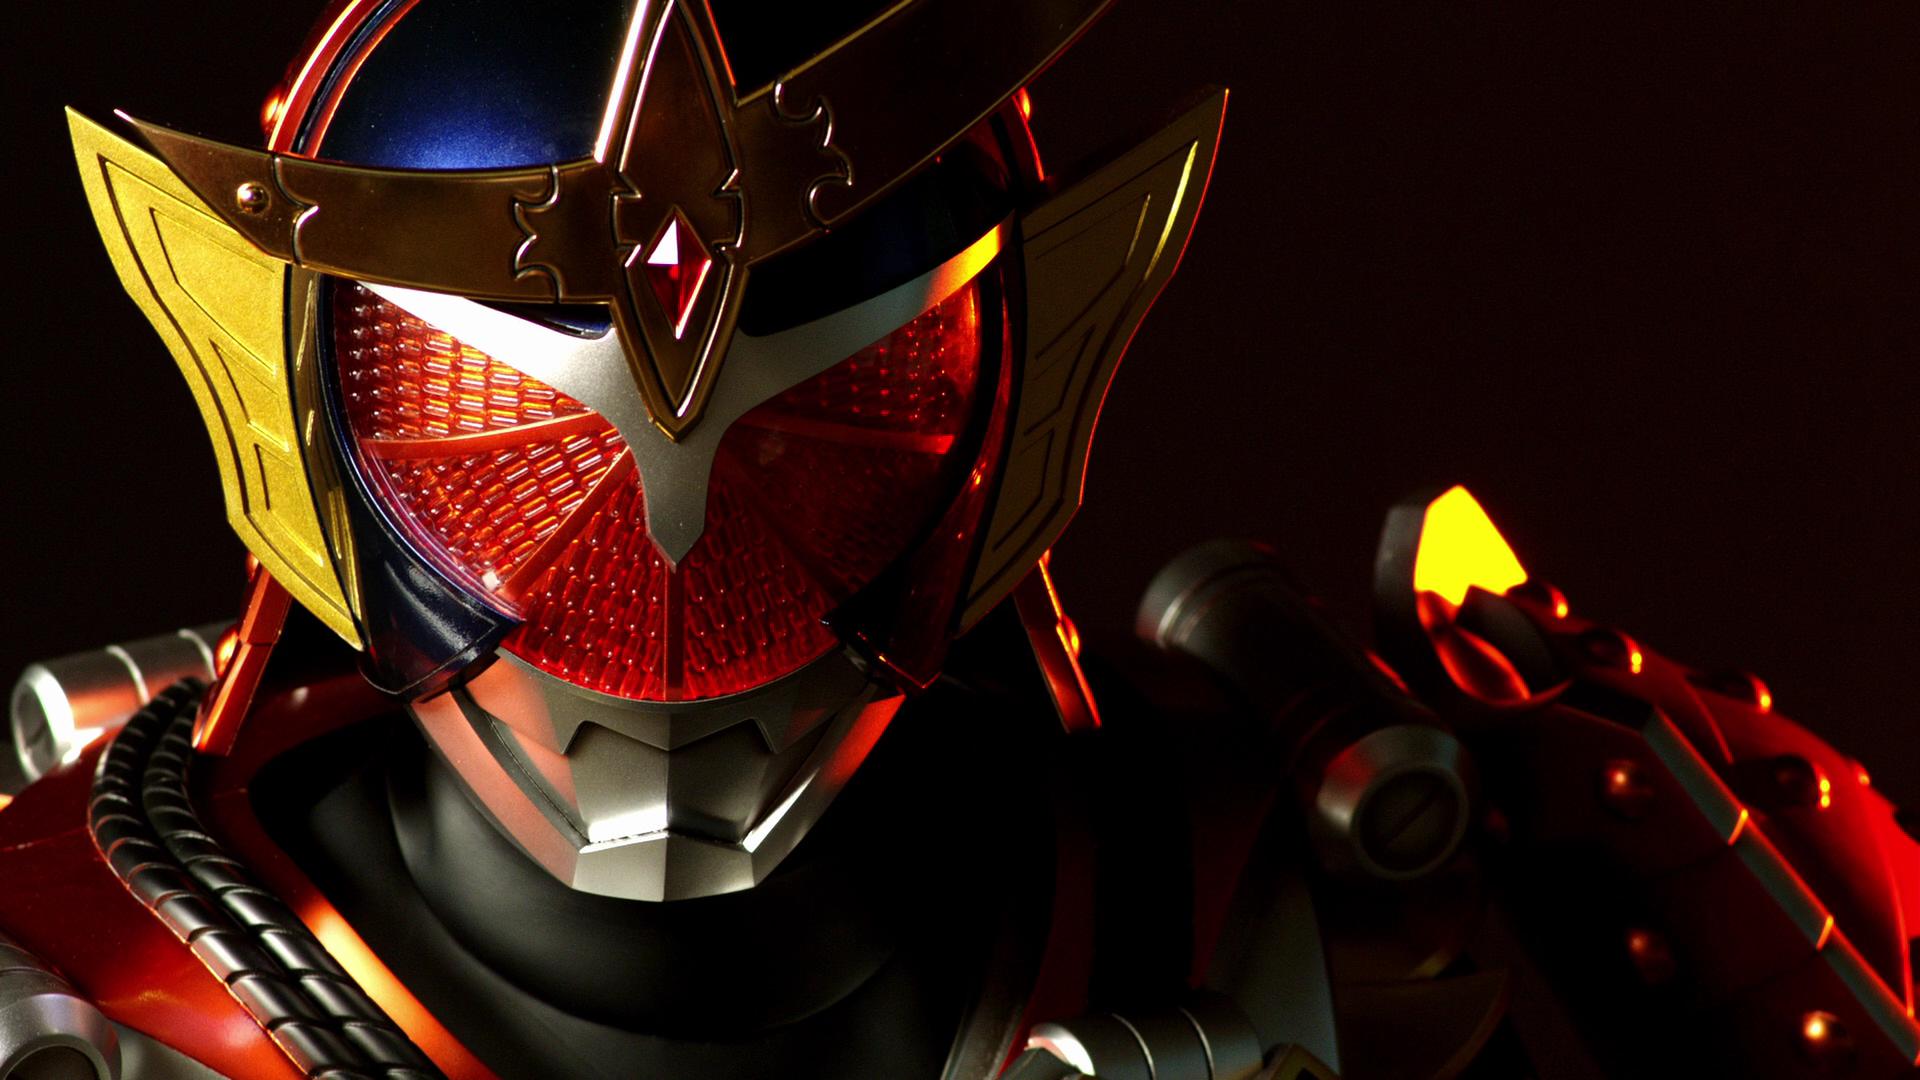 http://bandofgeeks.fr/wp-content/uploads/2014/10/Kamen-Rider-Gaim-1.jpg